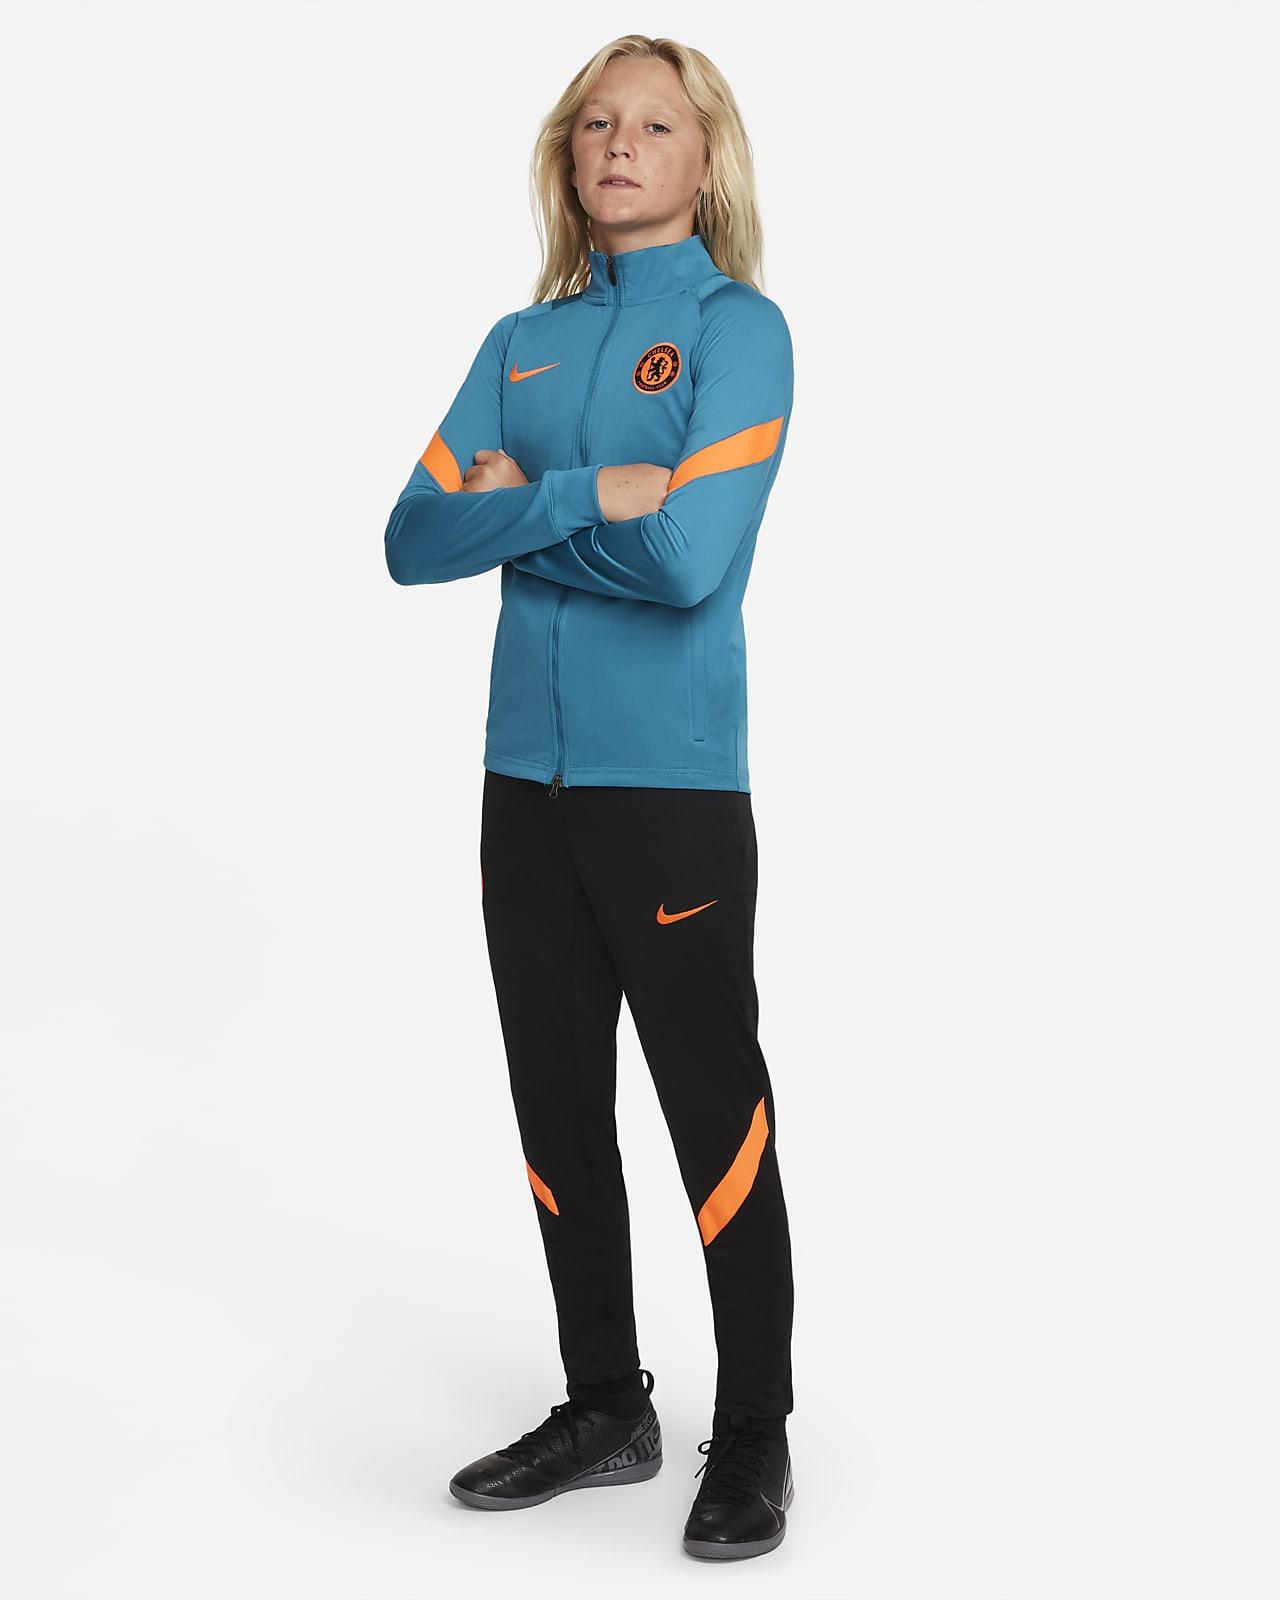 Chelsea F.C. Strike Older Kids' Nike Dri-FIT Knit Football Tracksuit